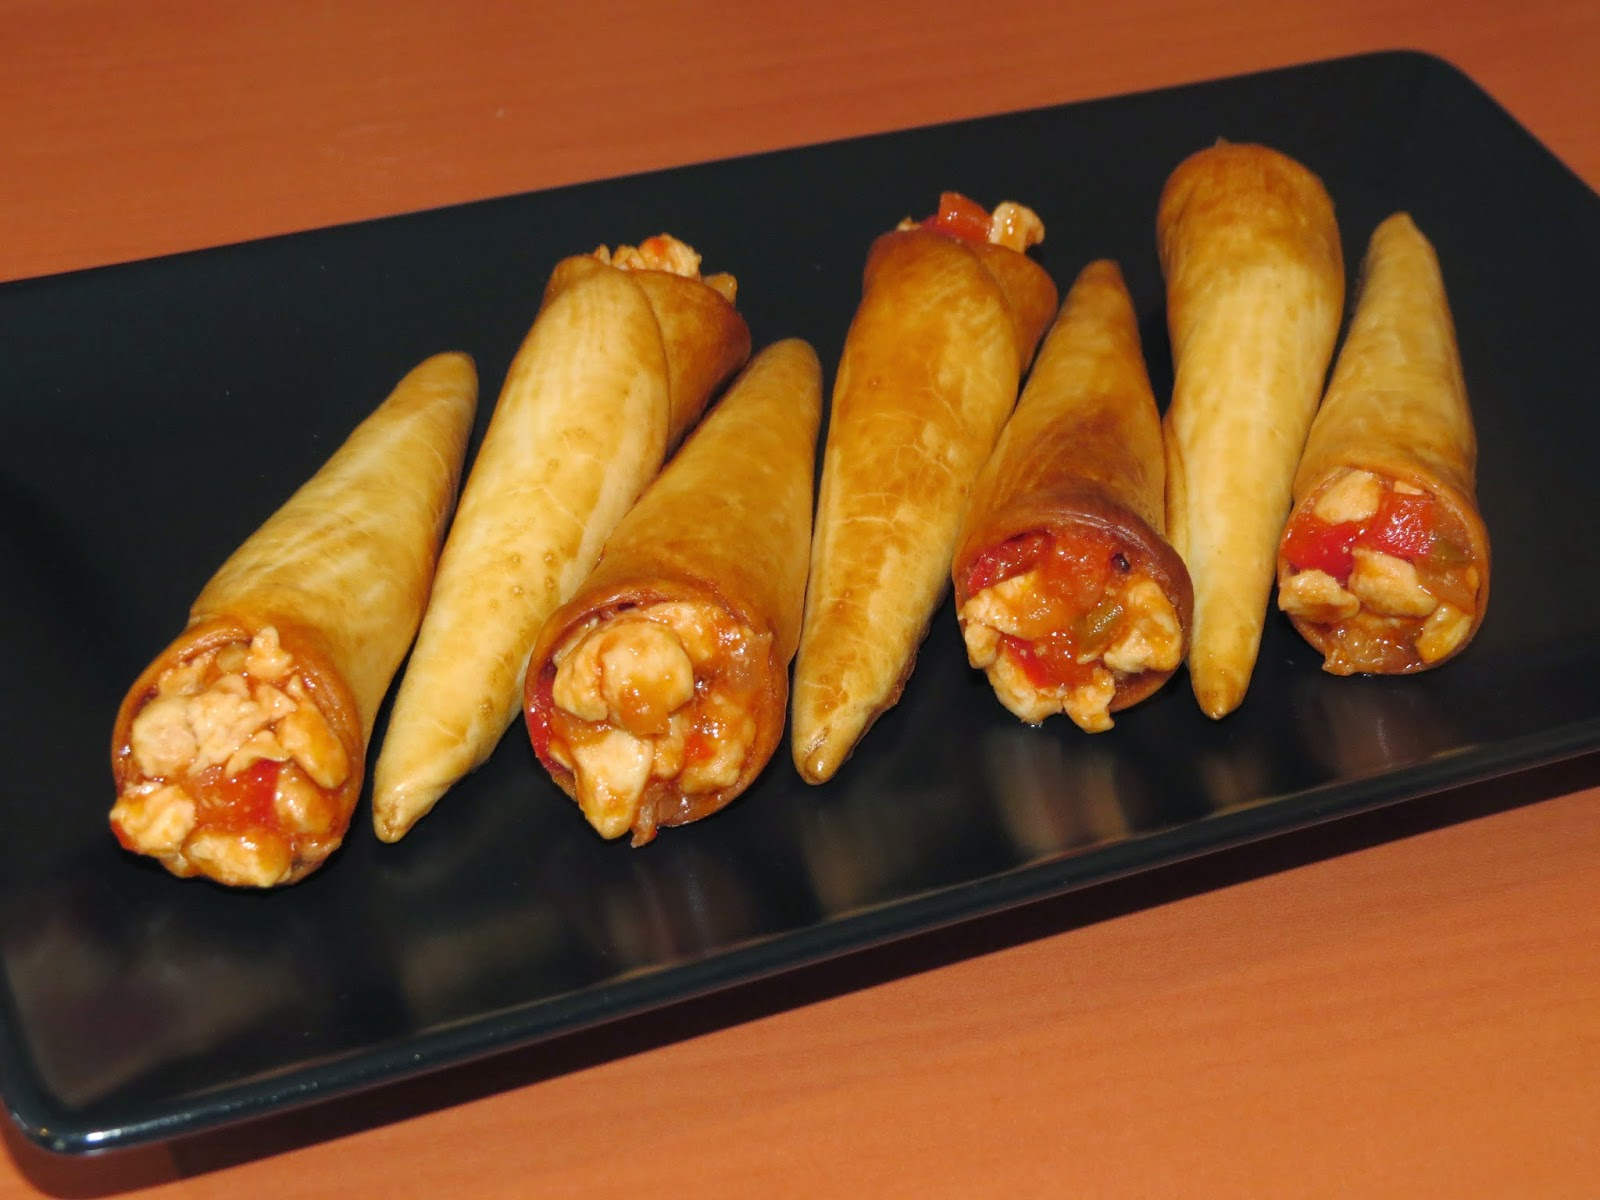 Burrito-cucuruchos de pollo con salsa barbacoa